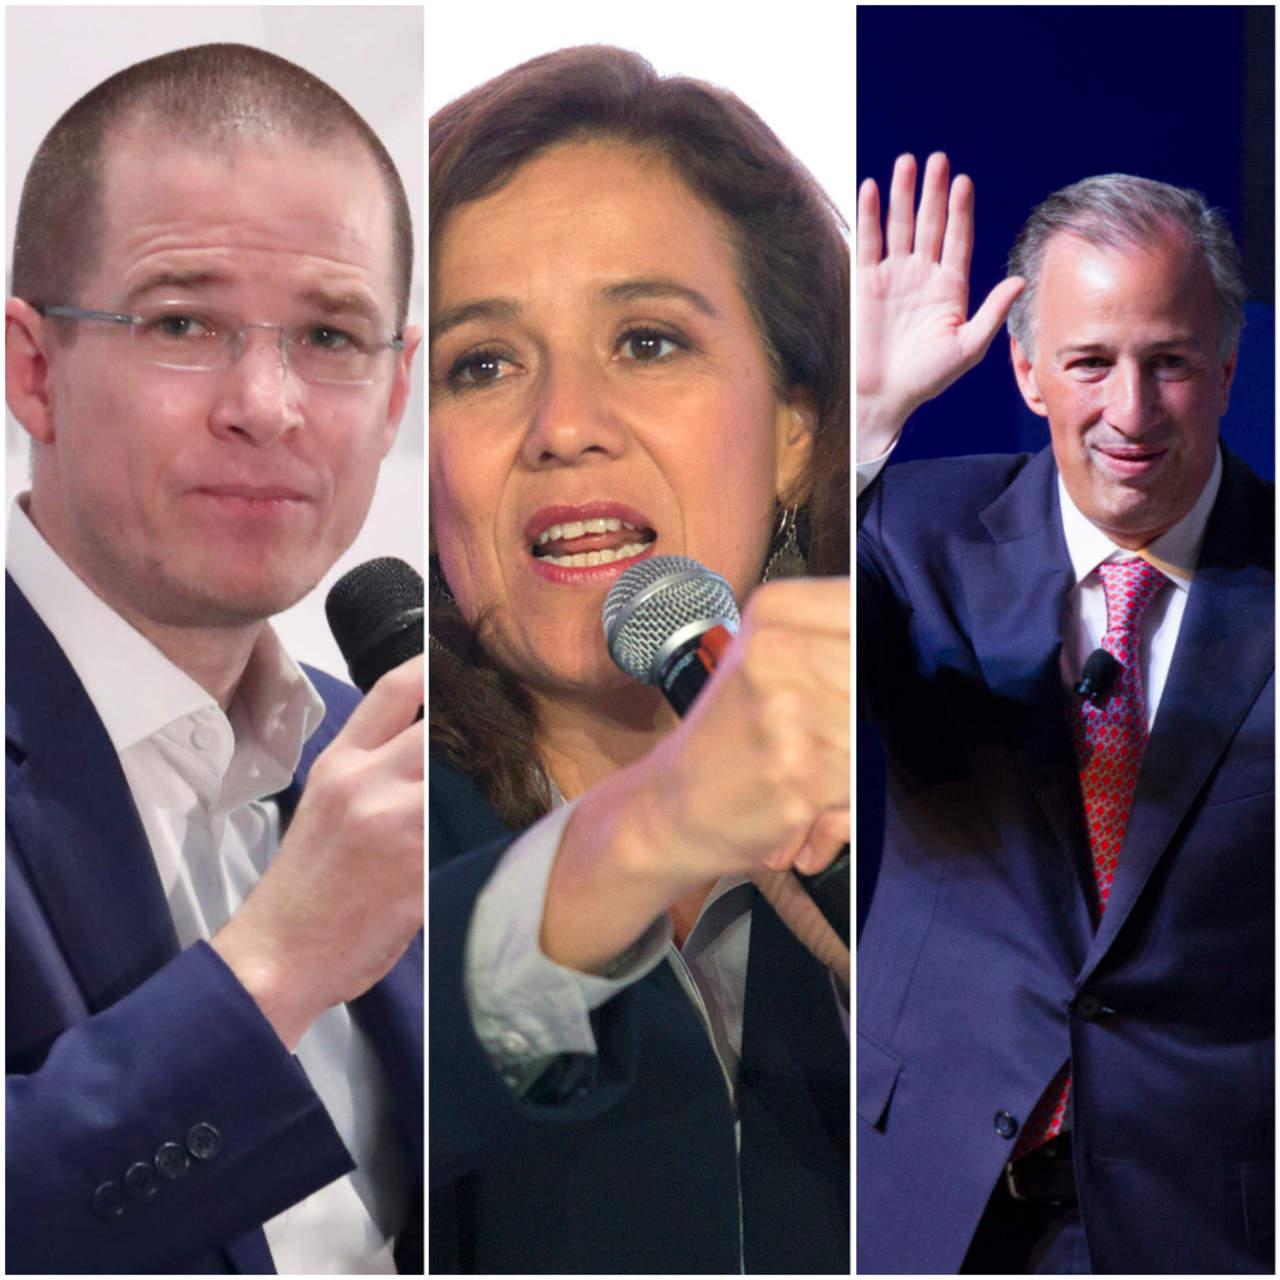 Van por votos de Margarita Zavala